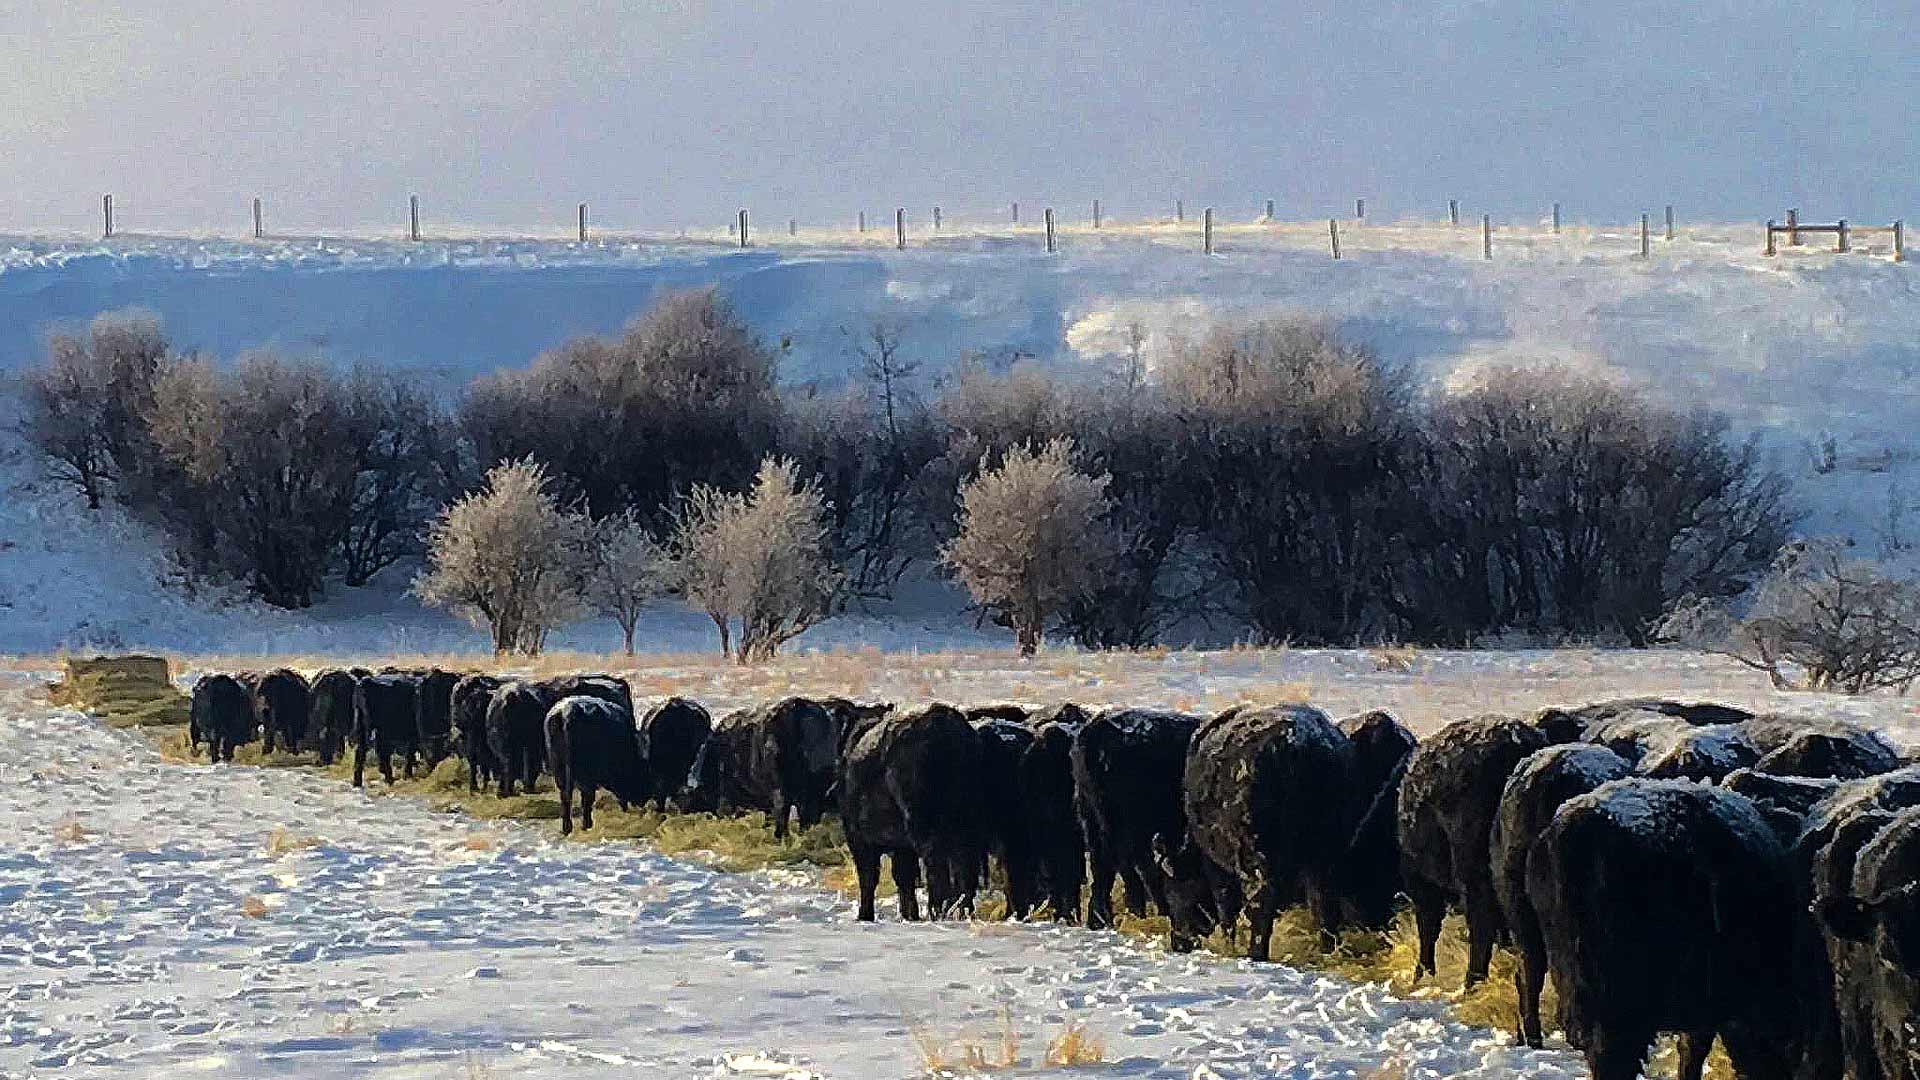 Round bale feeding during winter